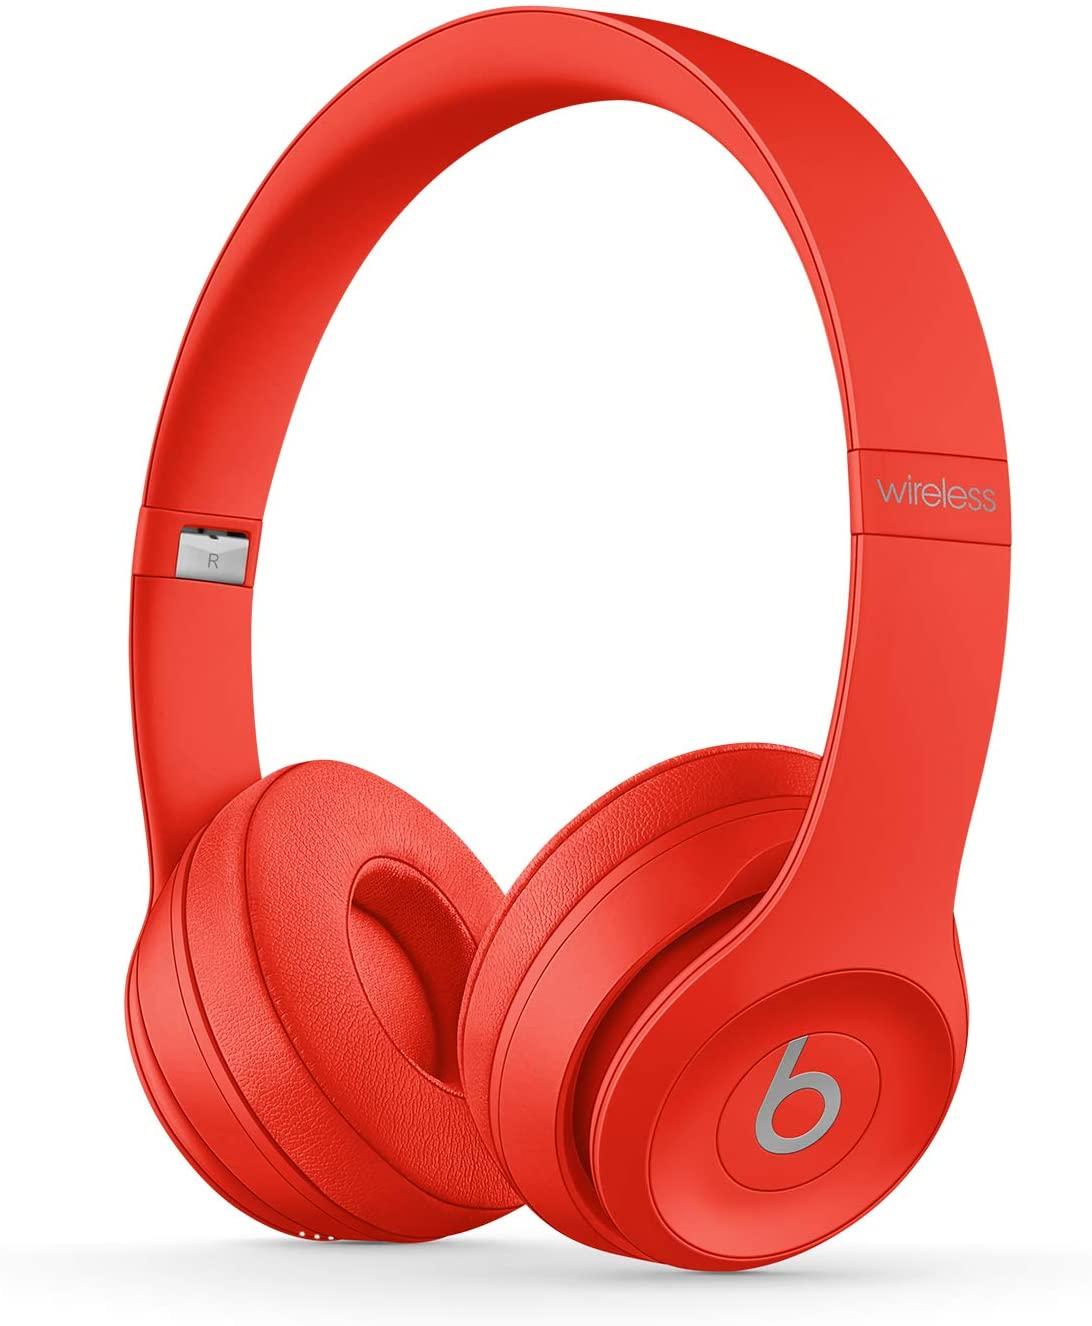 Beats Solo3 Wireless On-Ear Headphones For $124.99 @ Amazon